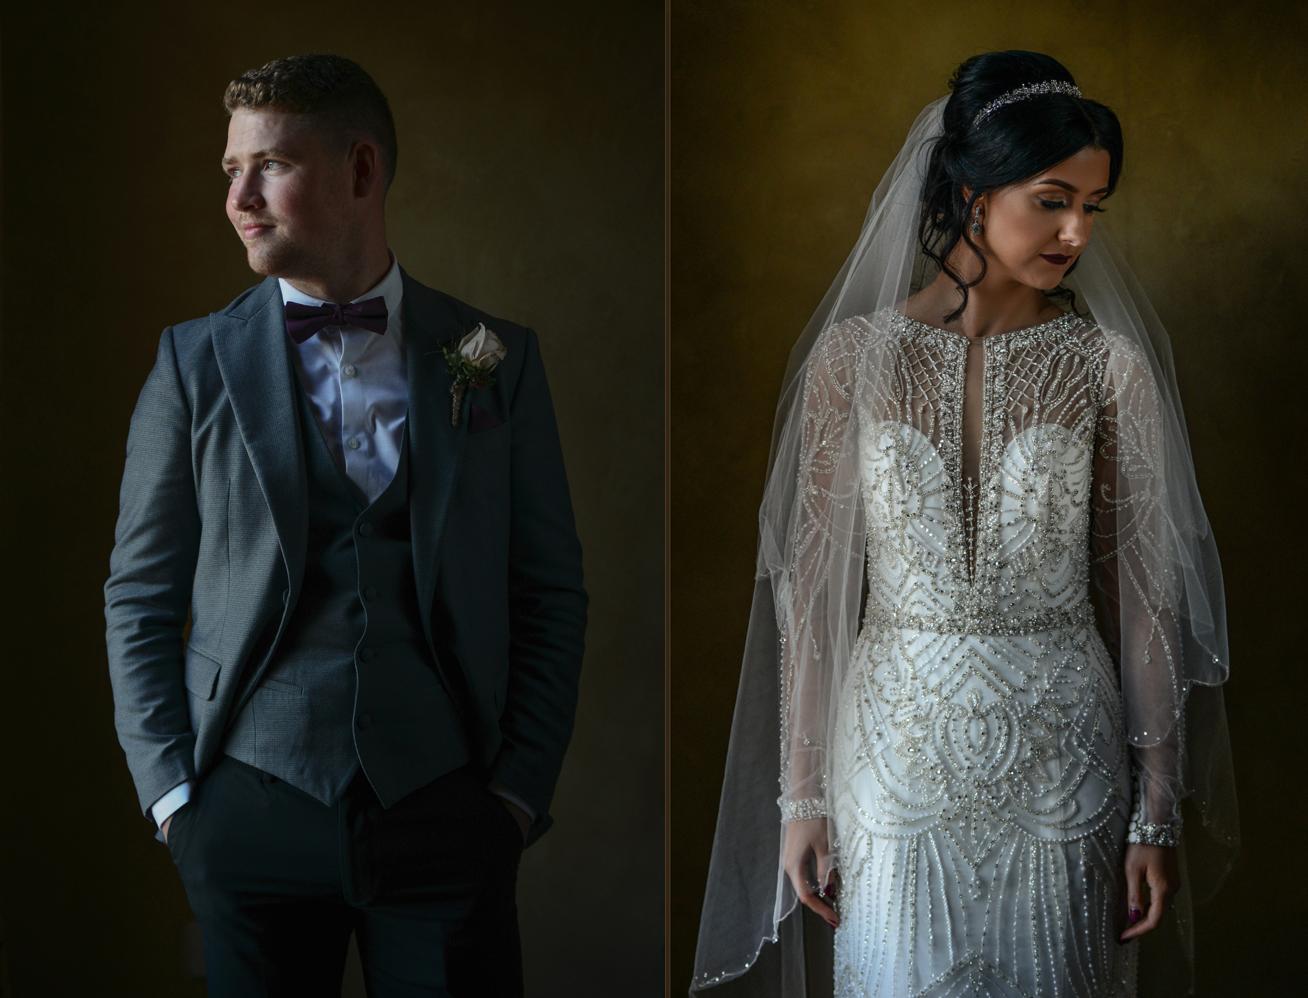 vintage-luxury-irish-wedding-bride-groom.png